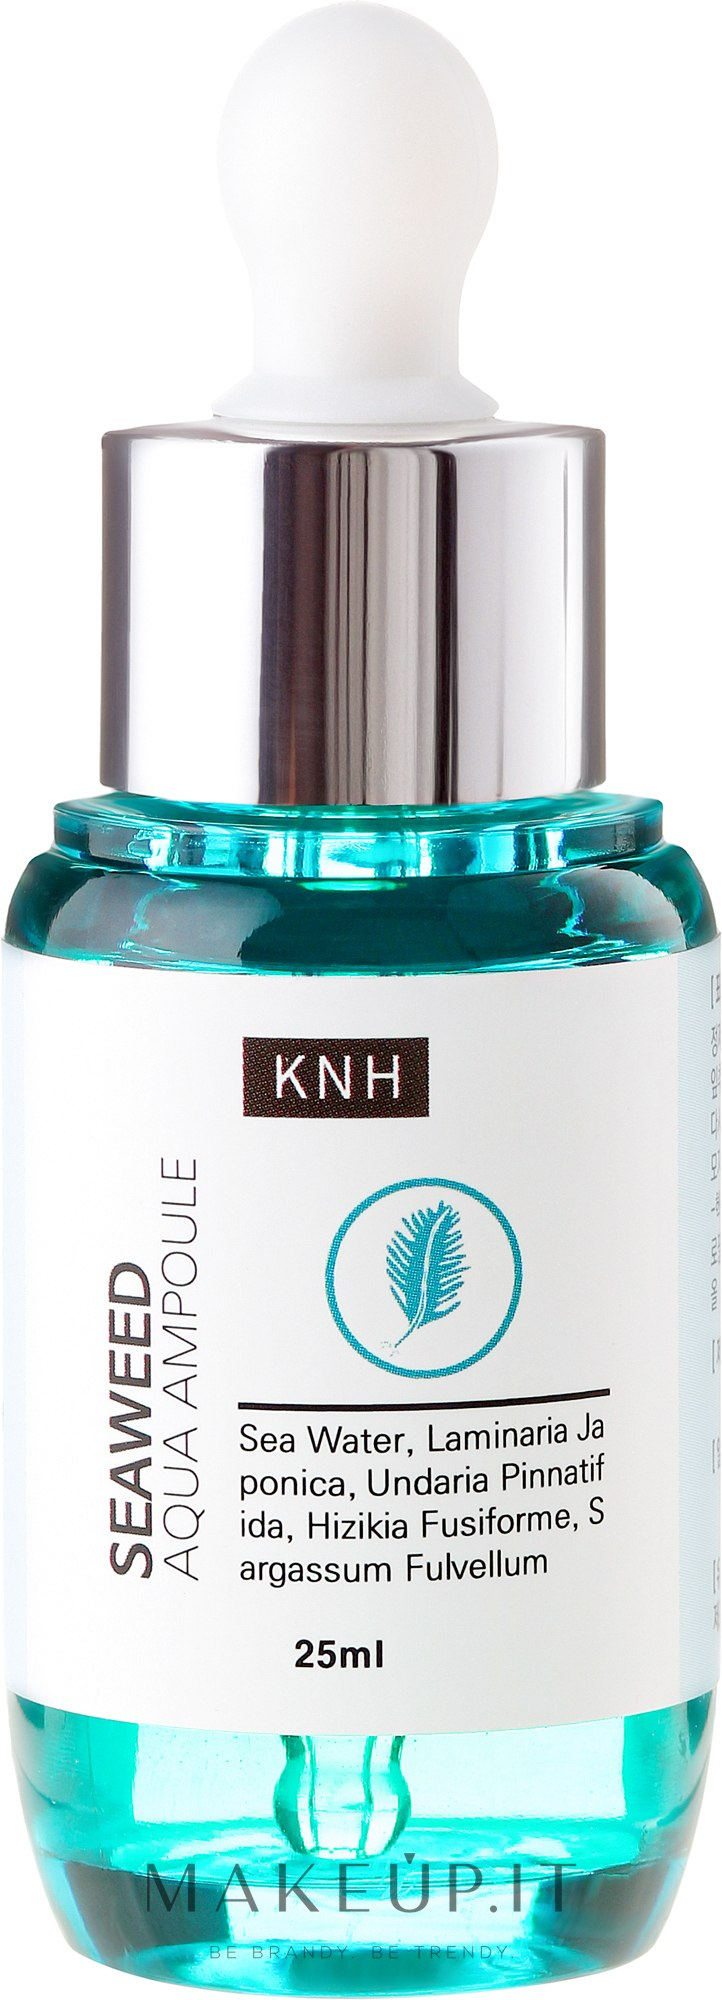 Siero viso idratante - KNH Seaweed Aqua Ampoule — foto 25 ml